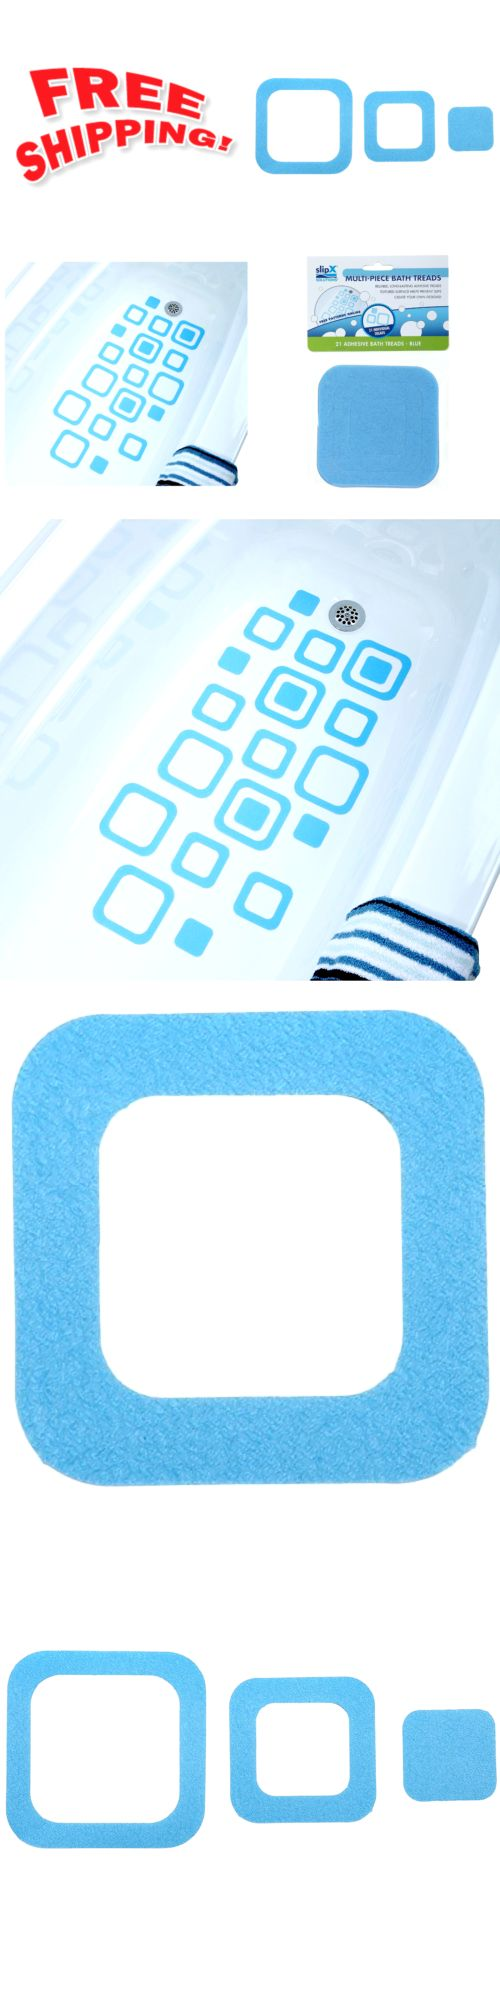 best 25 non slip shower mat ideas only on pinterest dorm non slip appliques and mats 66722 bathtub treads non slip applique feet grip stickers